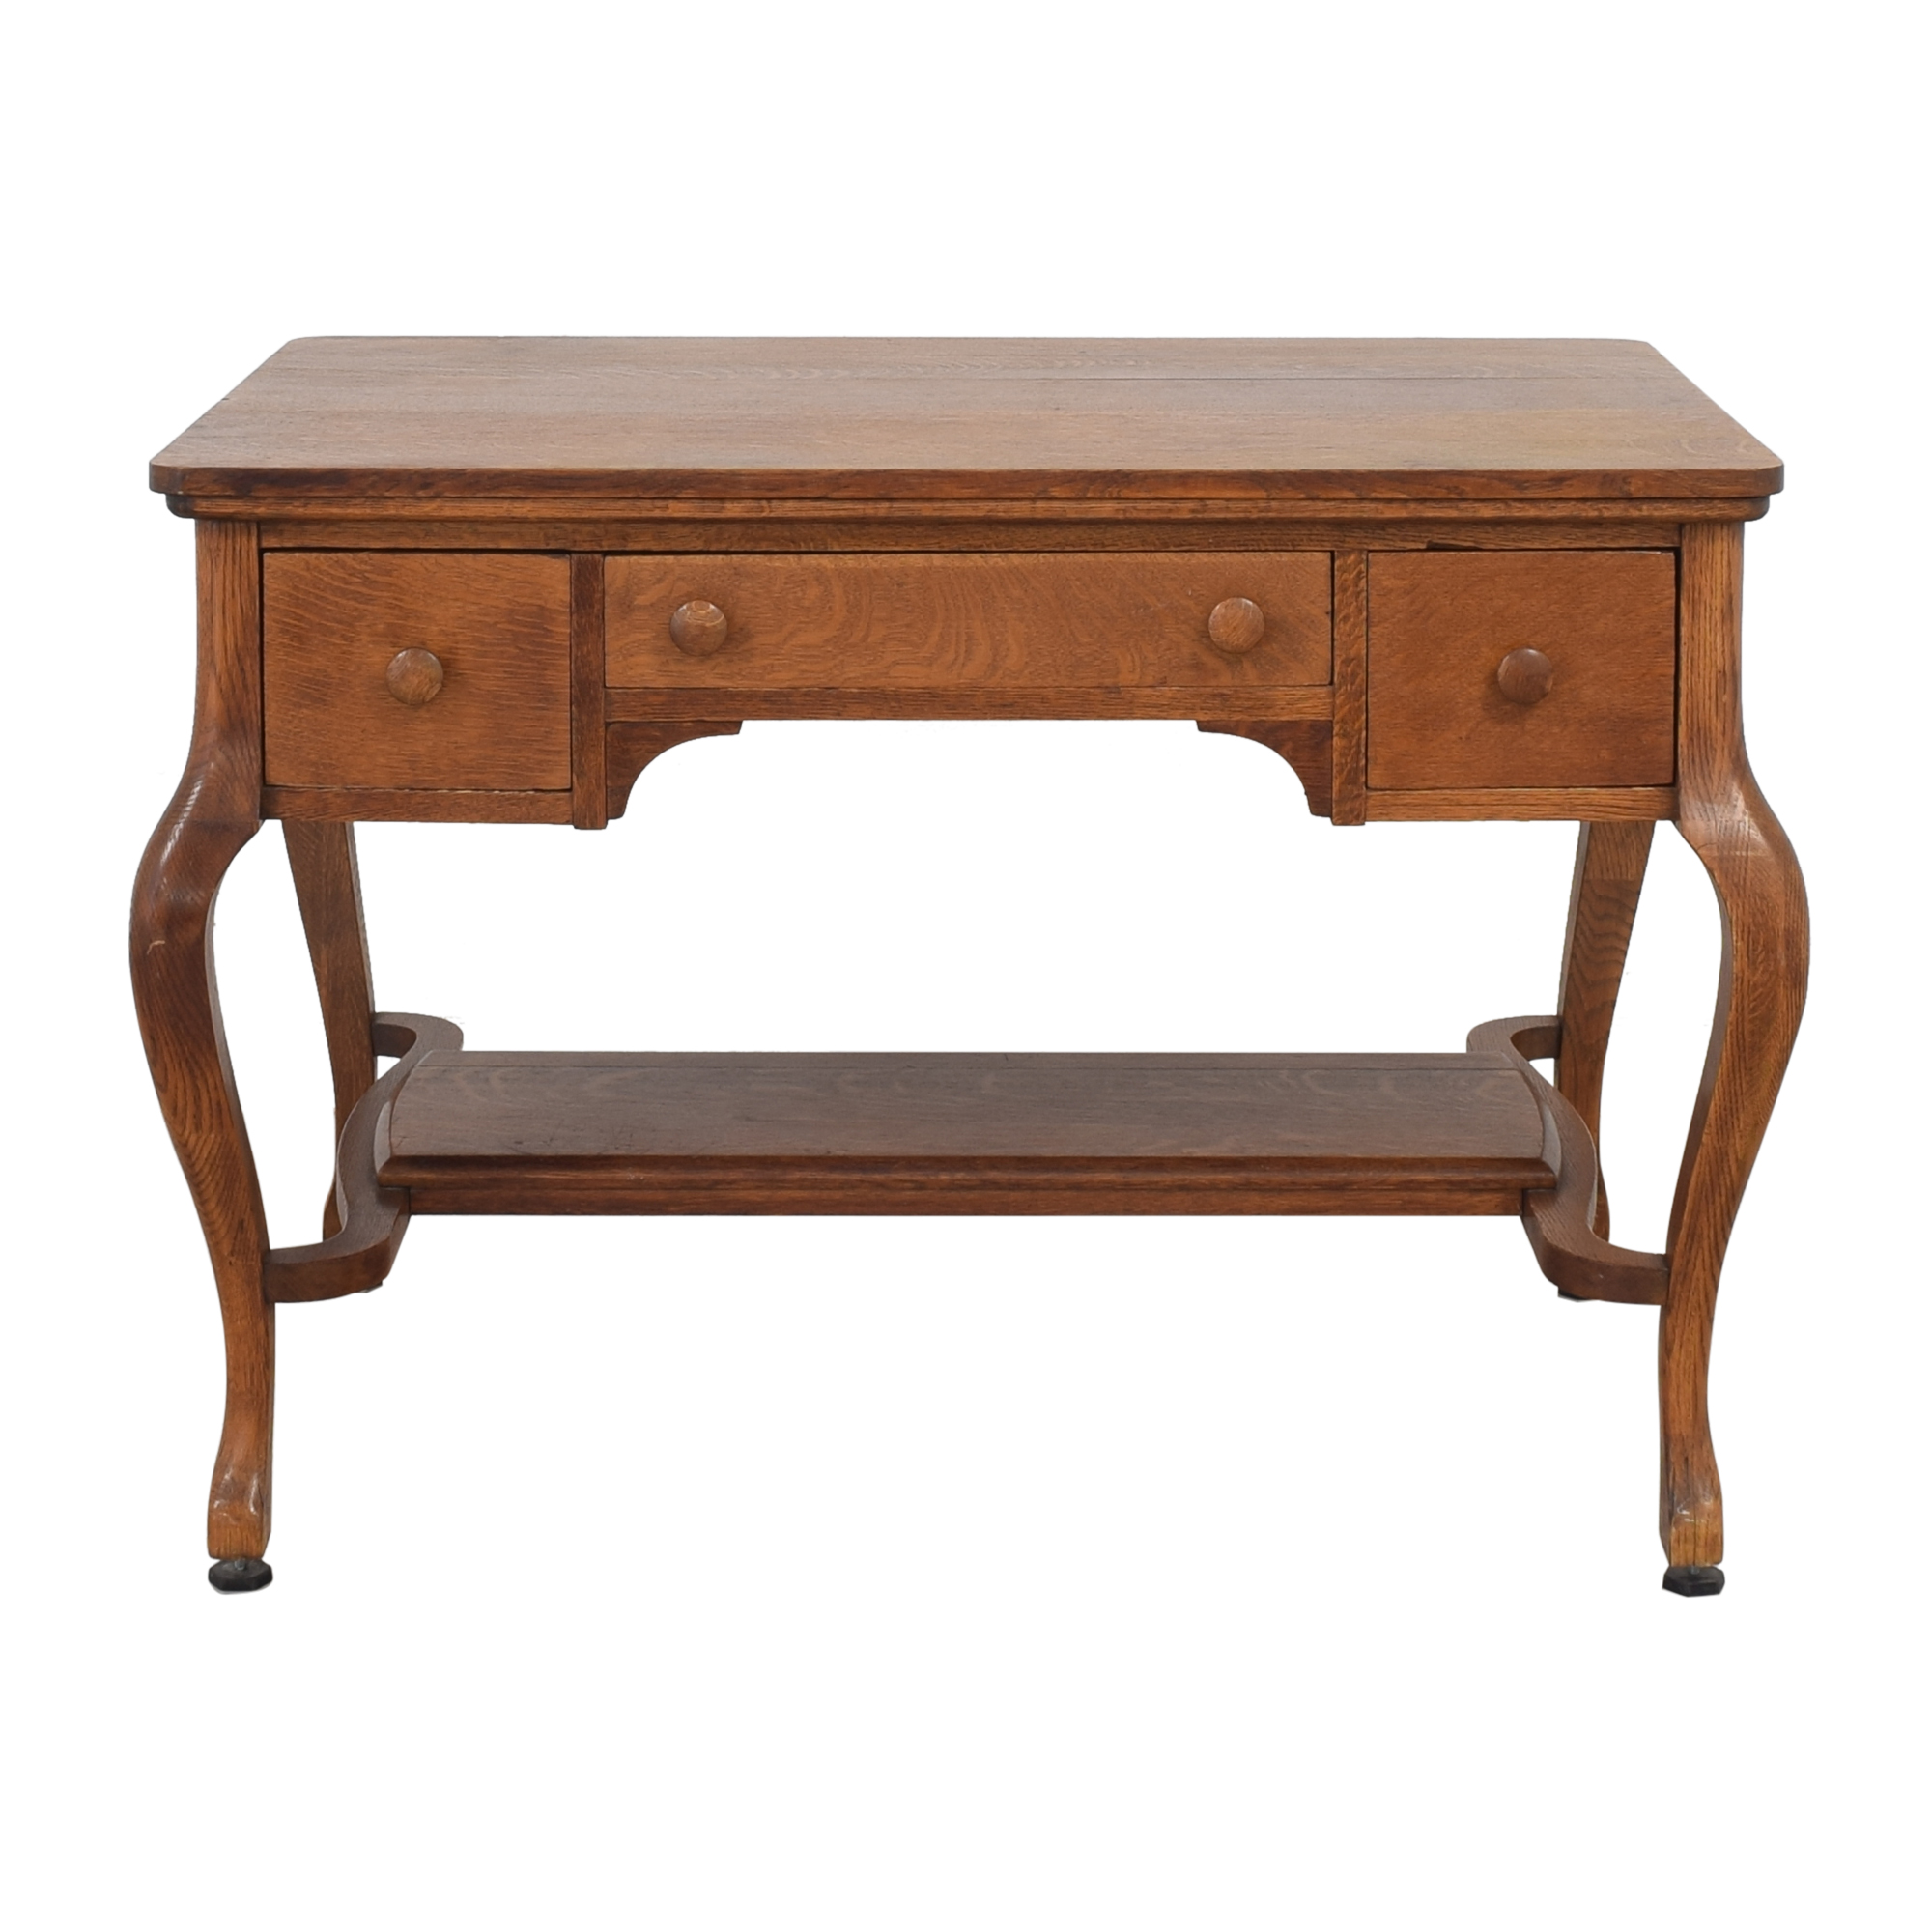 Vintage Desk With Drawers on sale